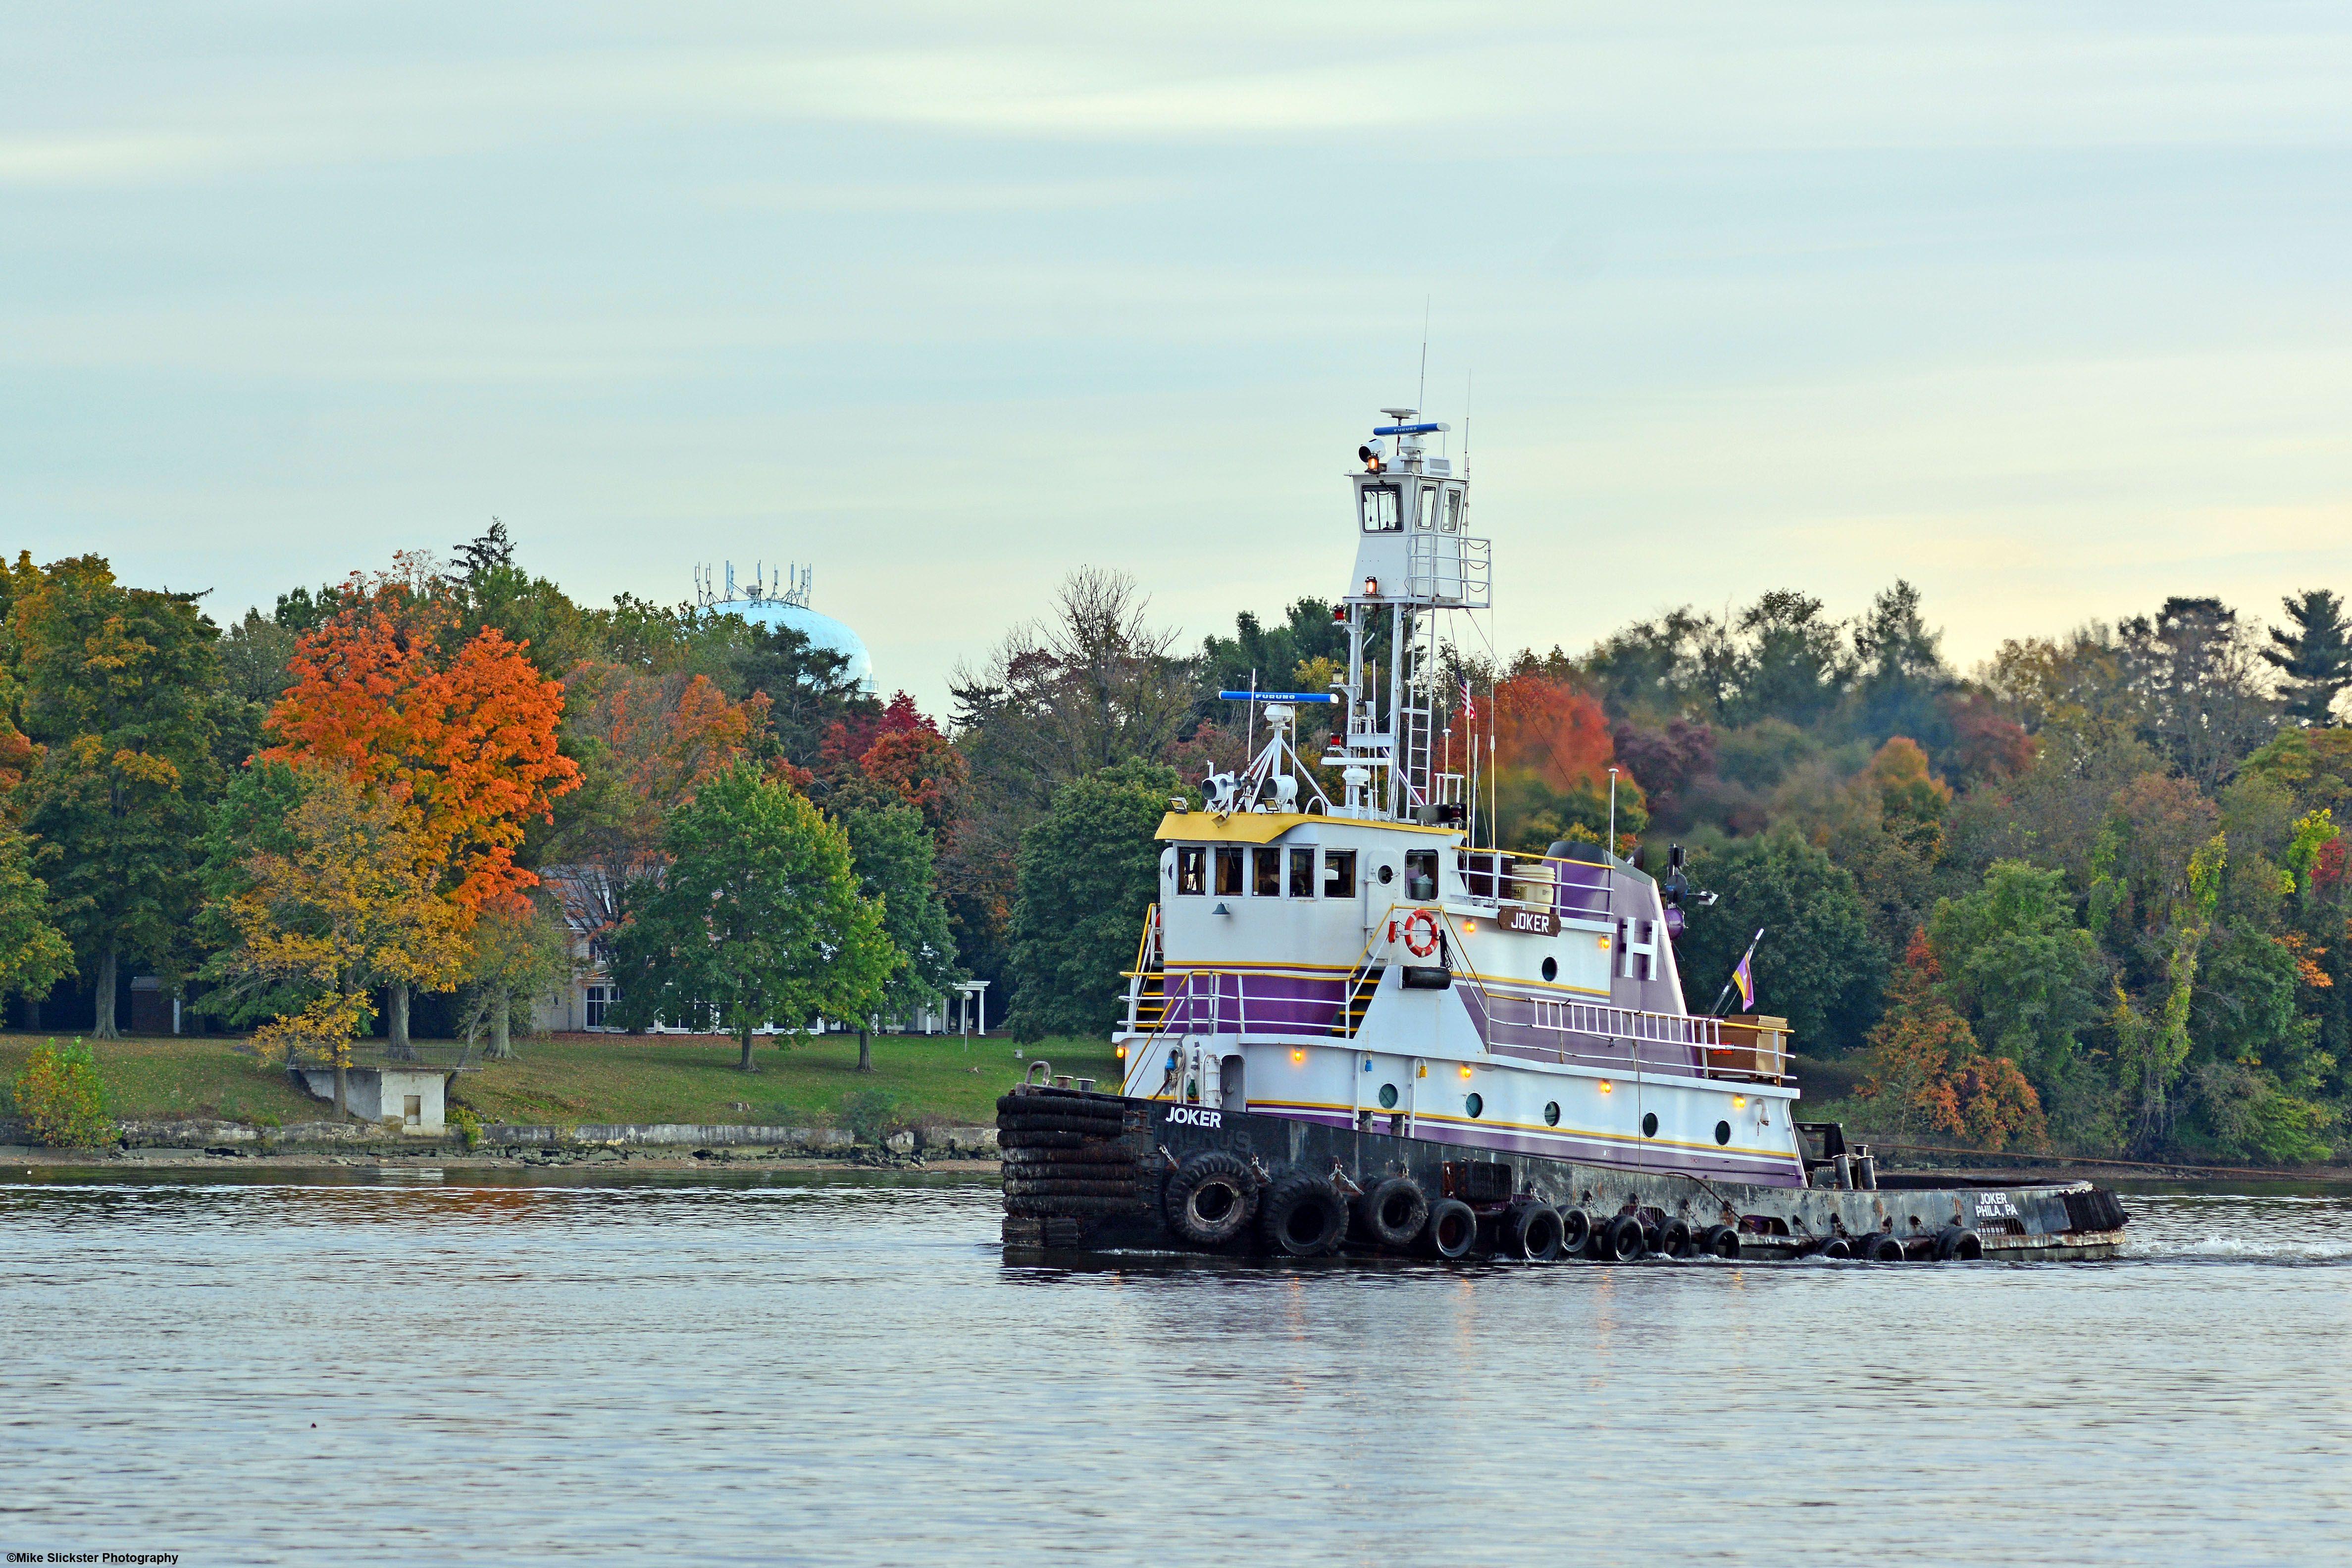 Tugboat Joker out of Philadelphia, towing a line of dredging